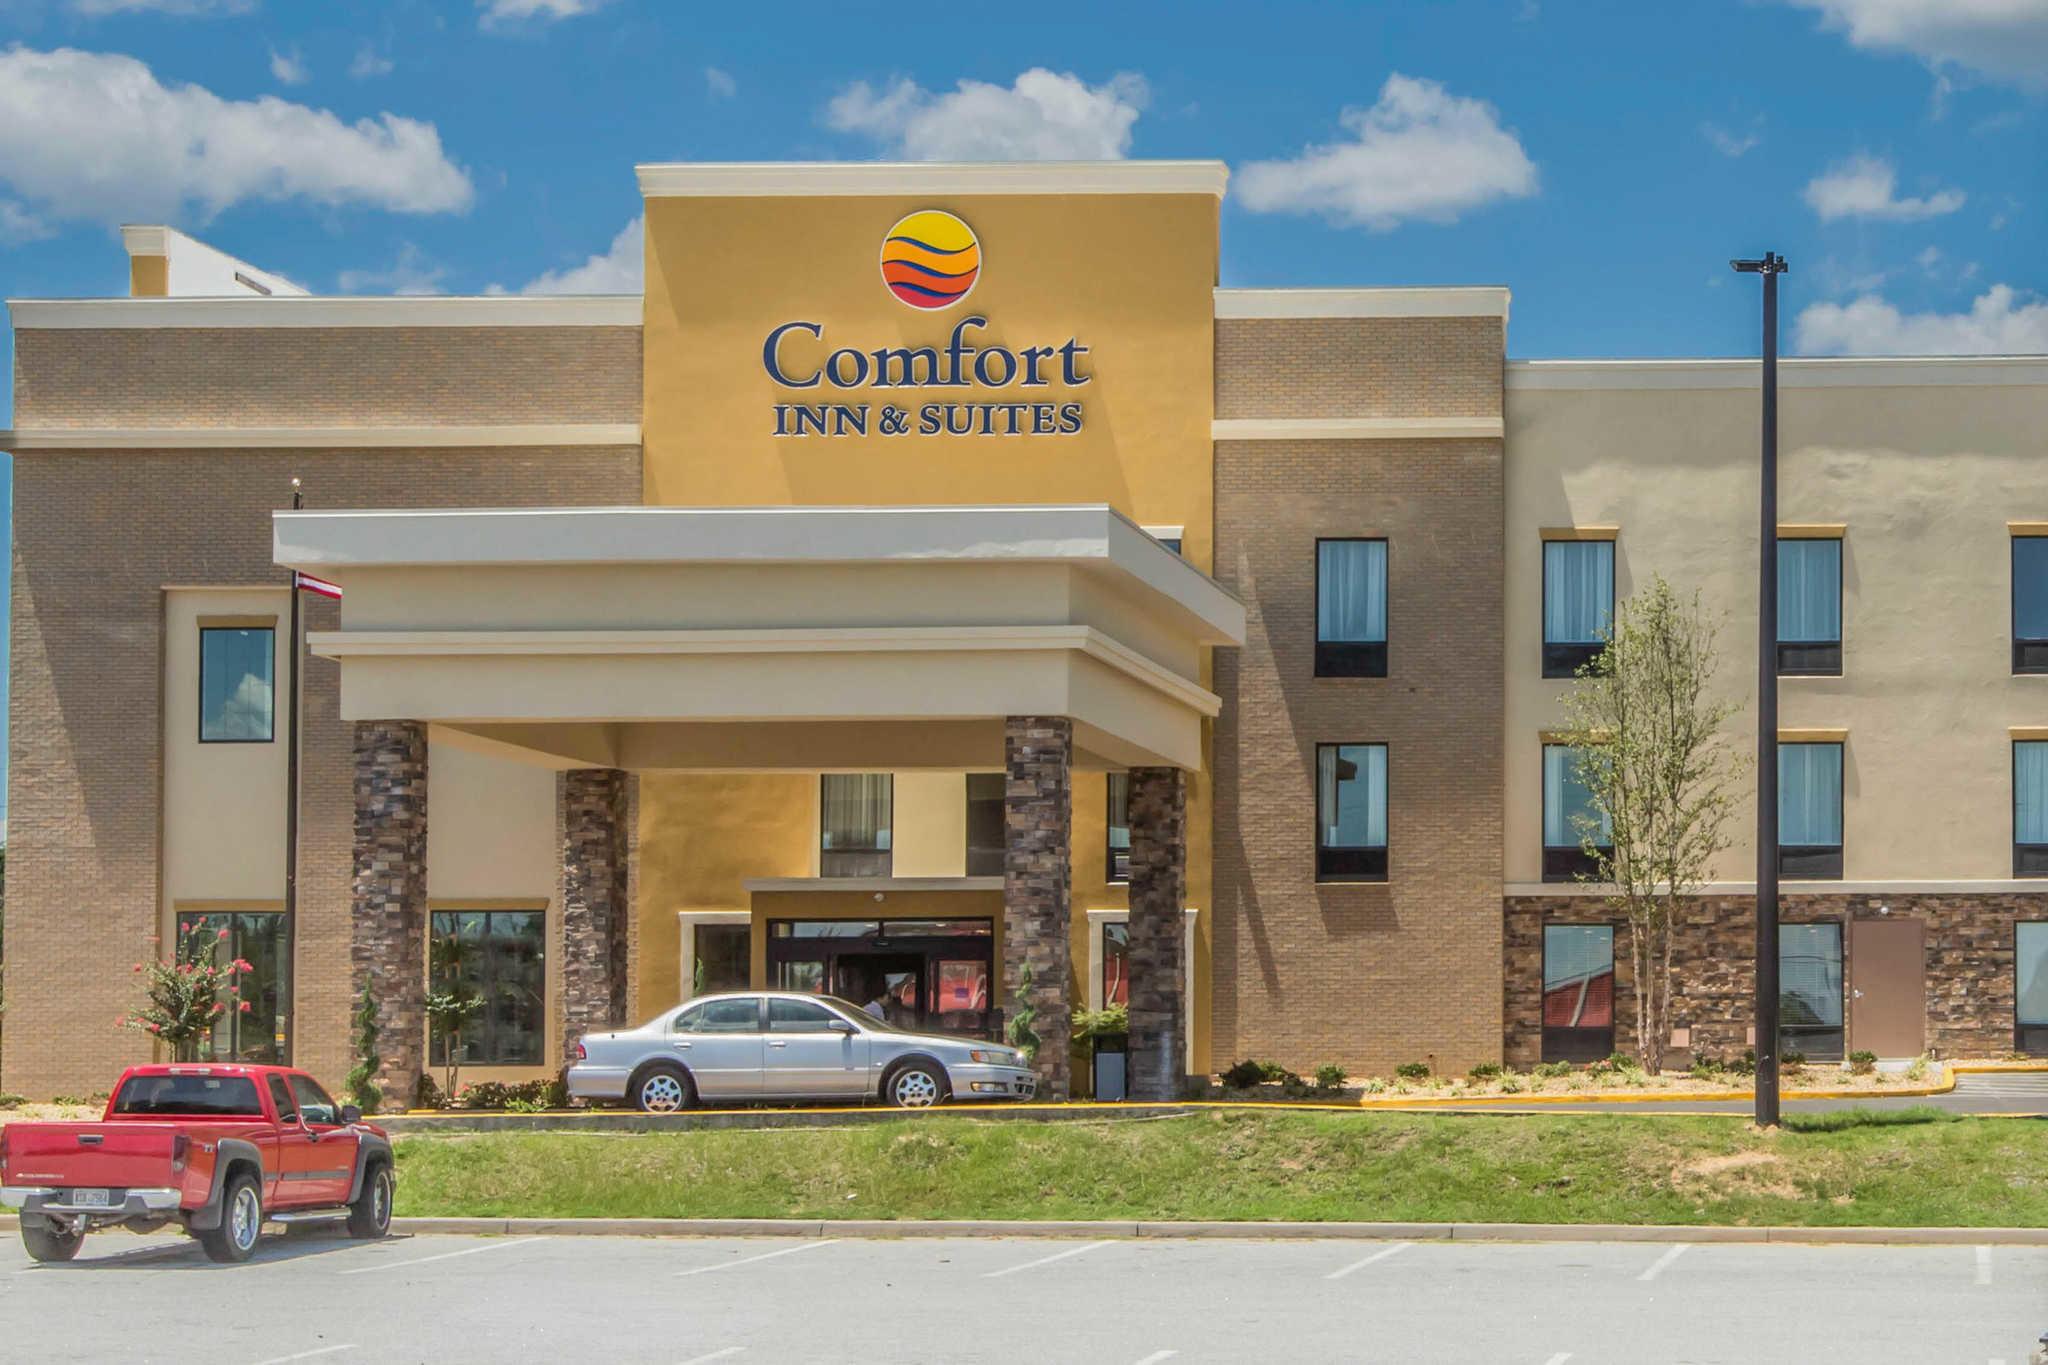 Comfort Inn & Suites West image 2